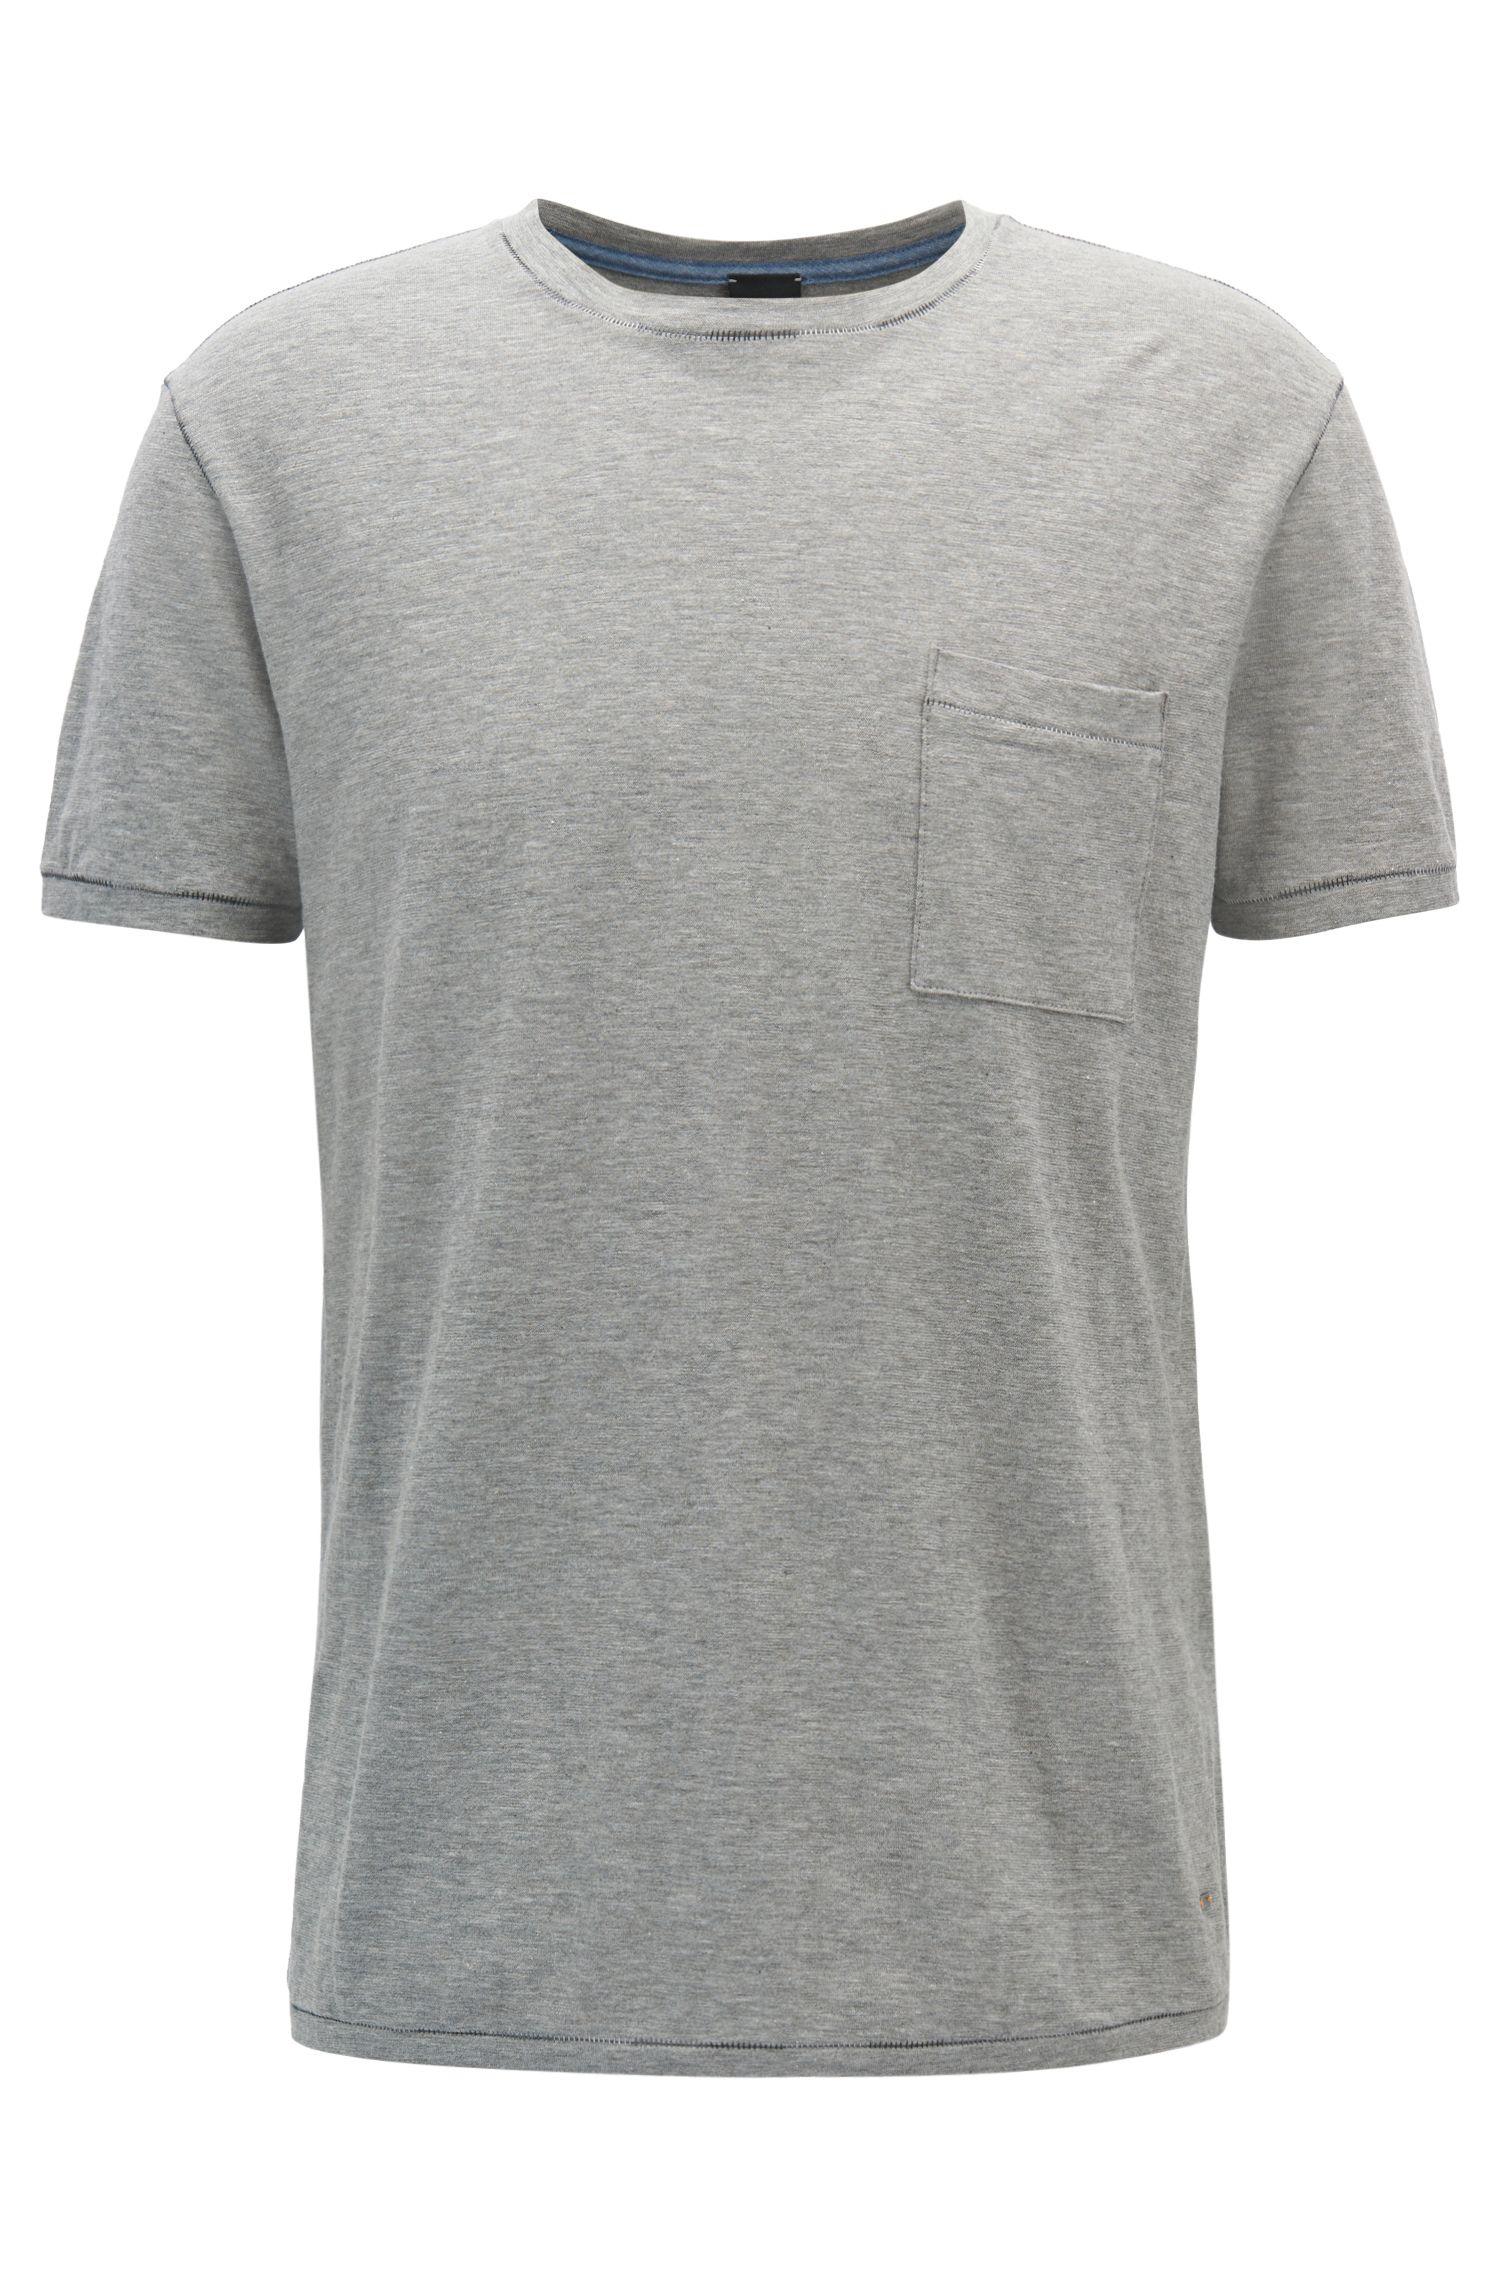 T-shirt relaxed fit in cotone slub-yarn